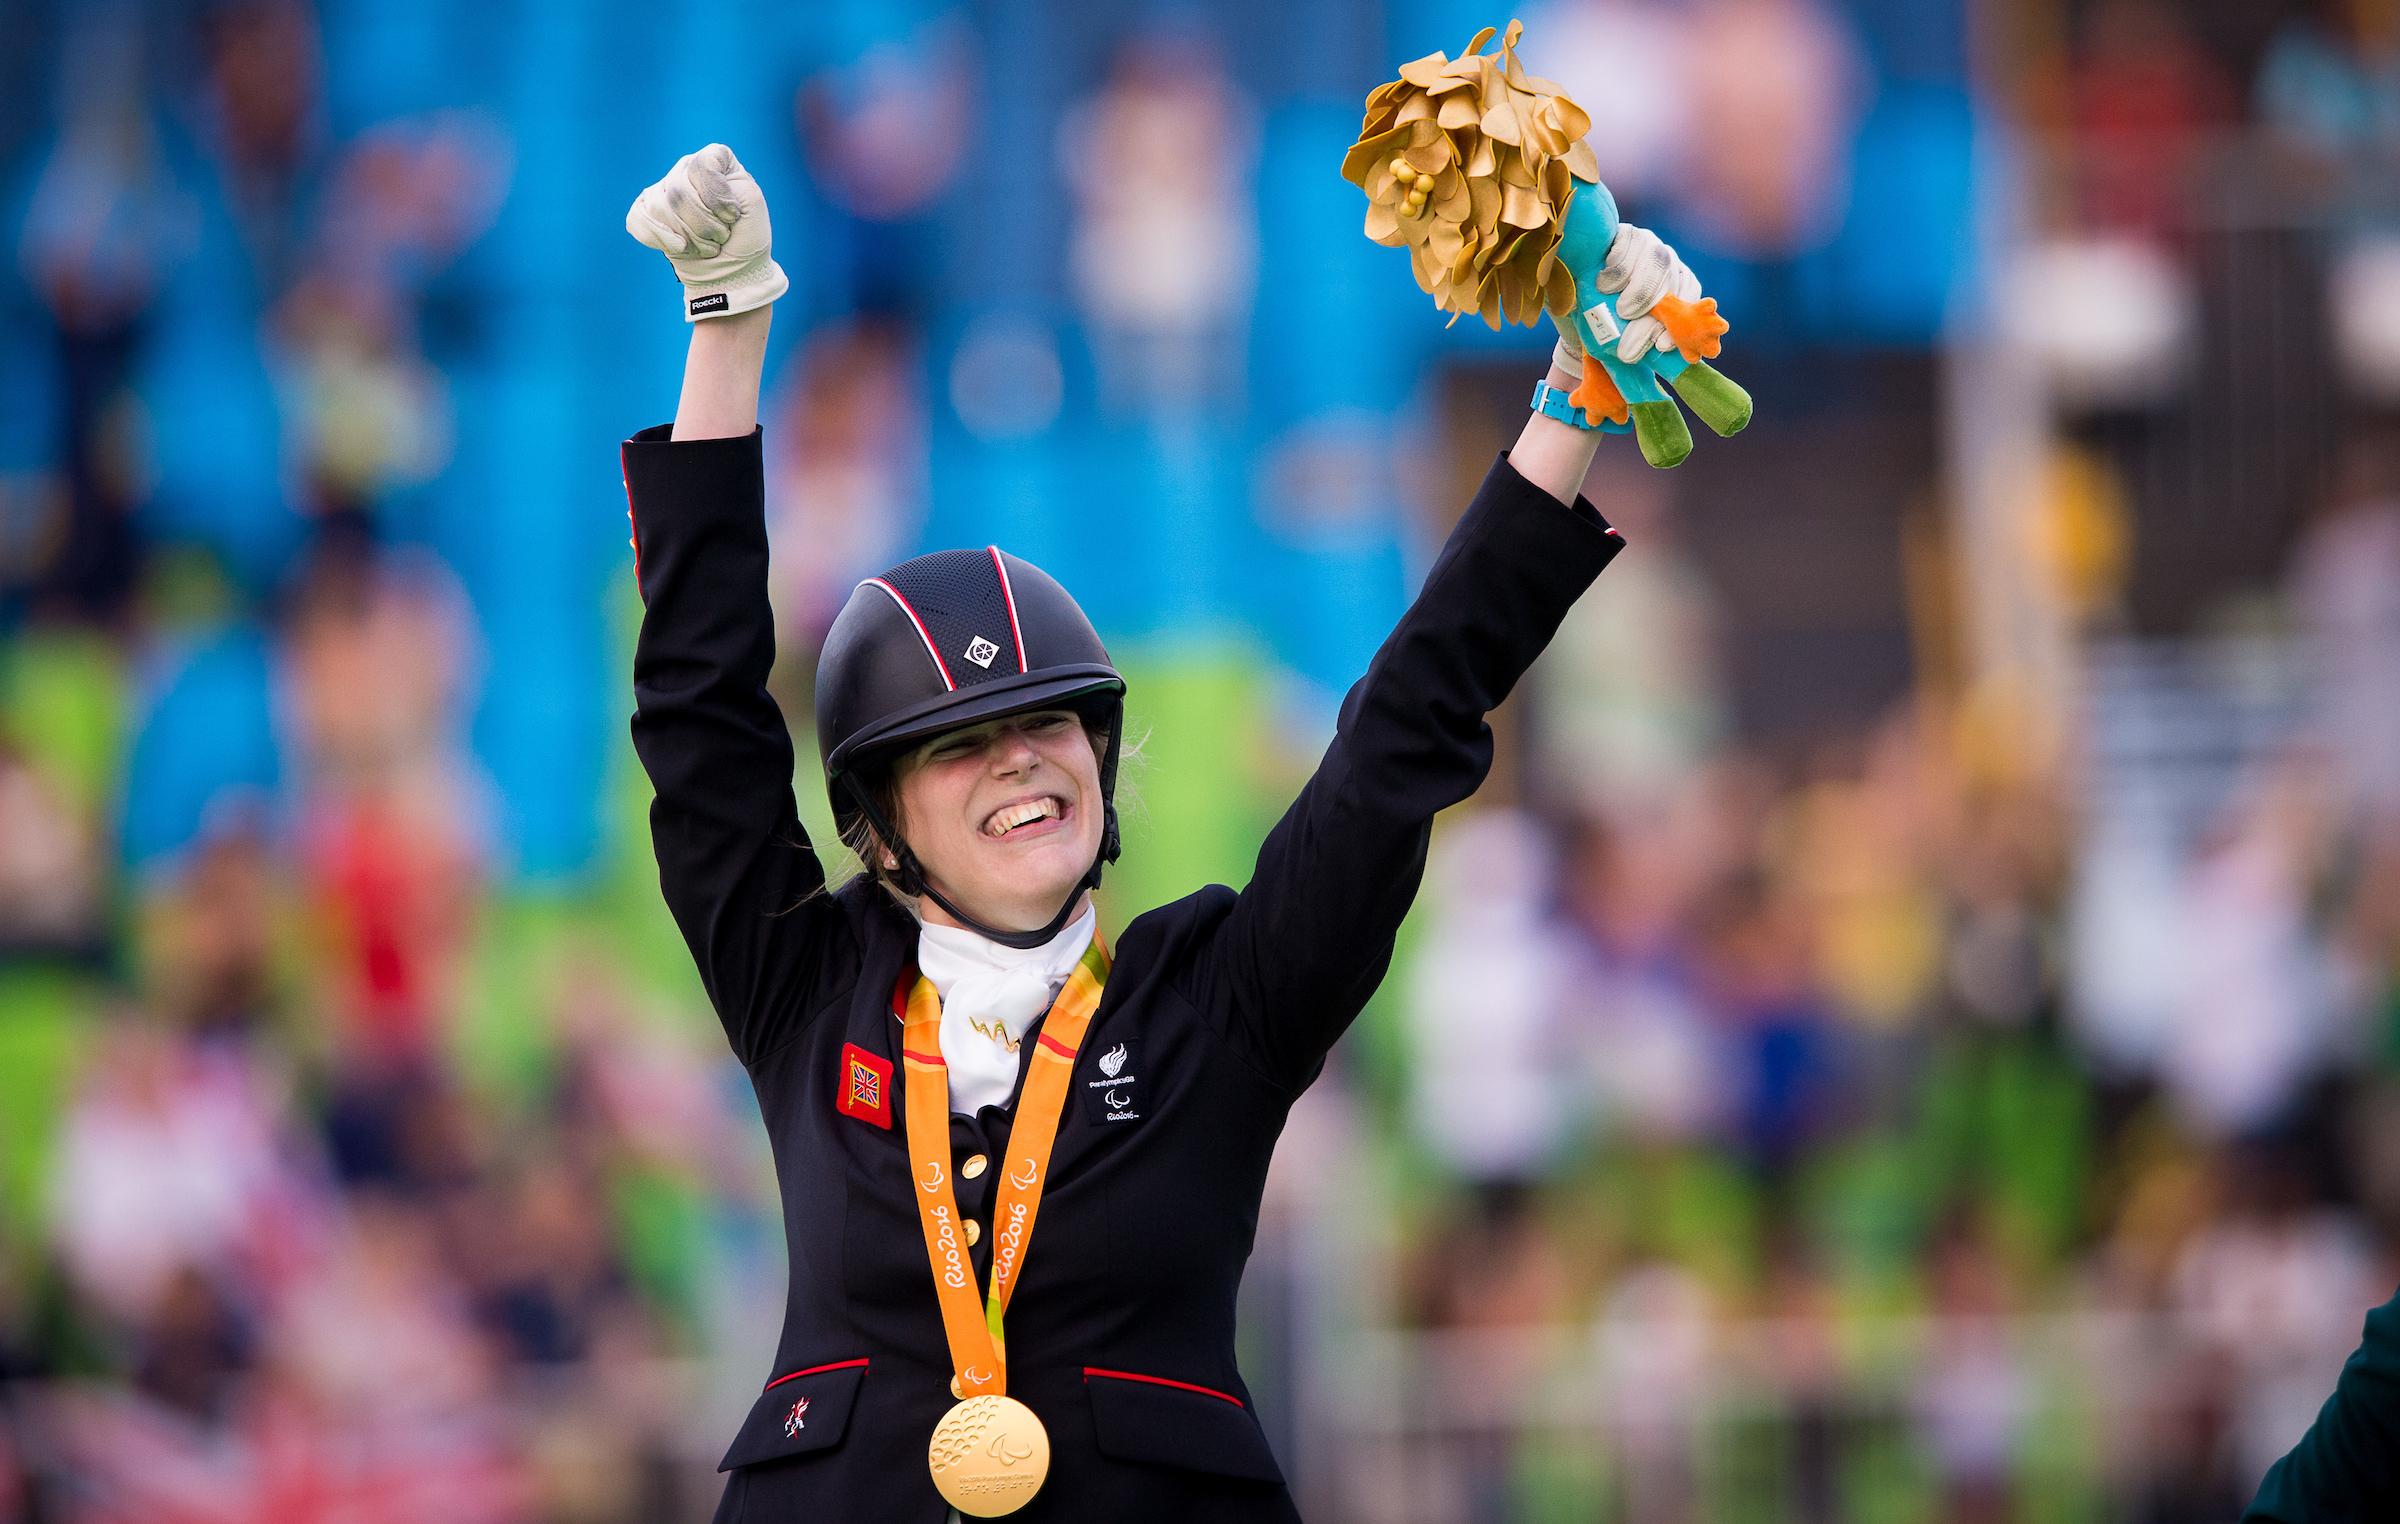 Sophie Christiansen wins gold (Credit: BEF/Jon Stroud Media)